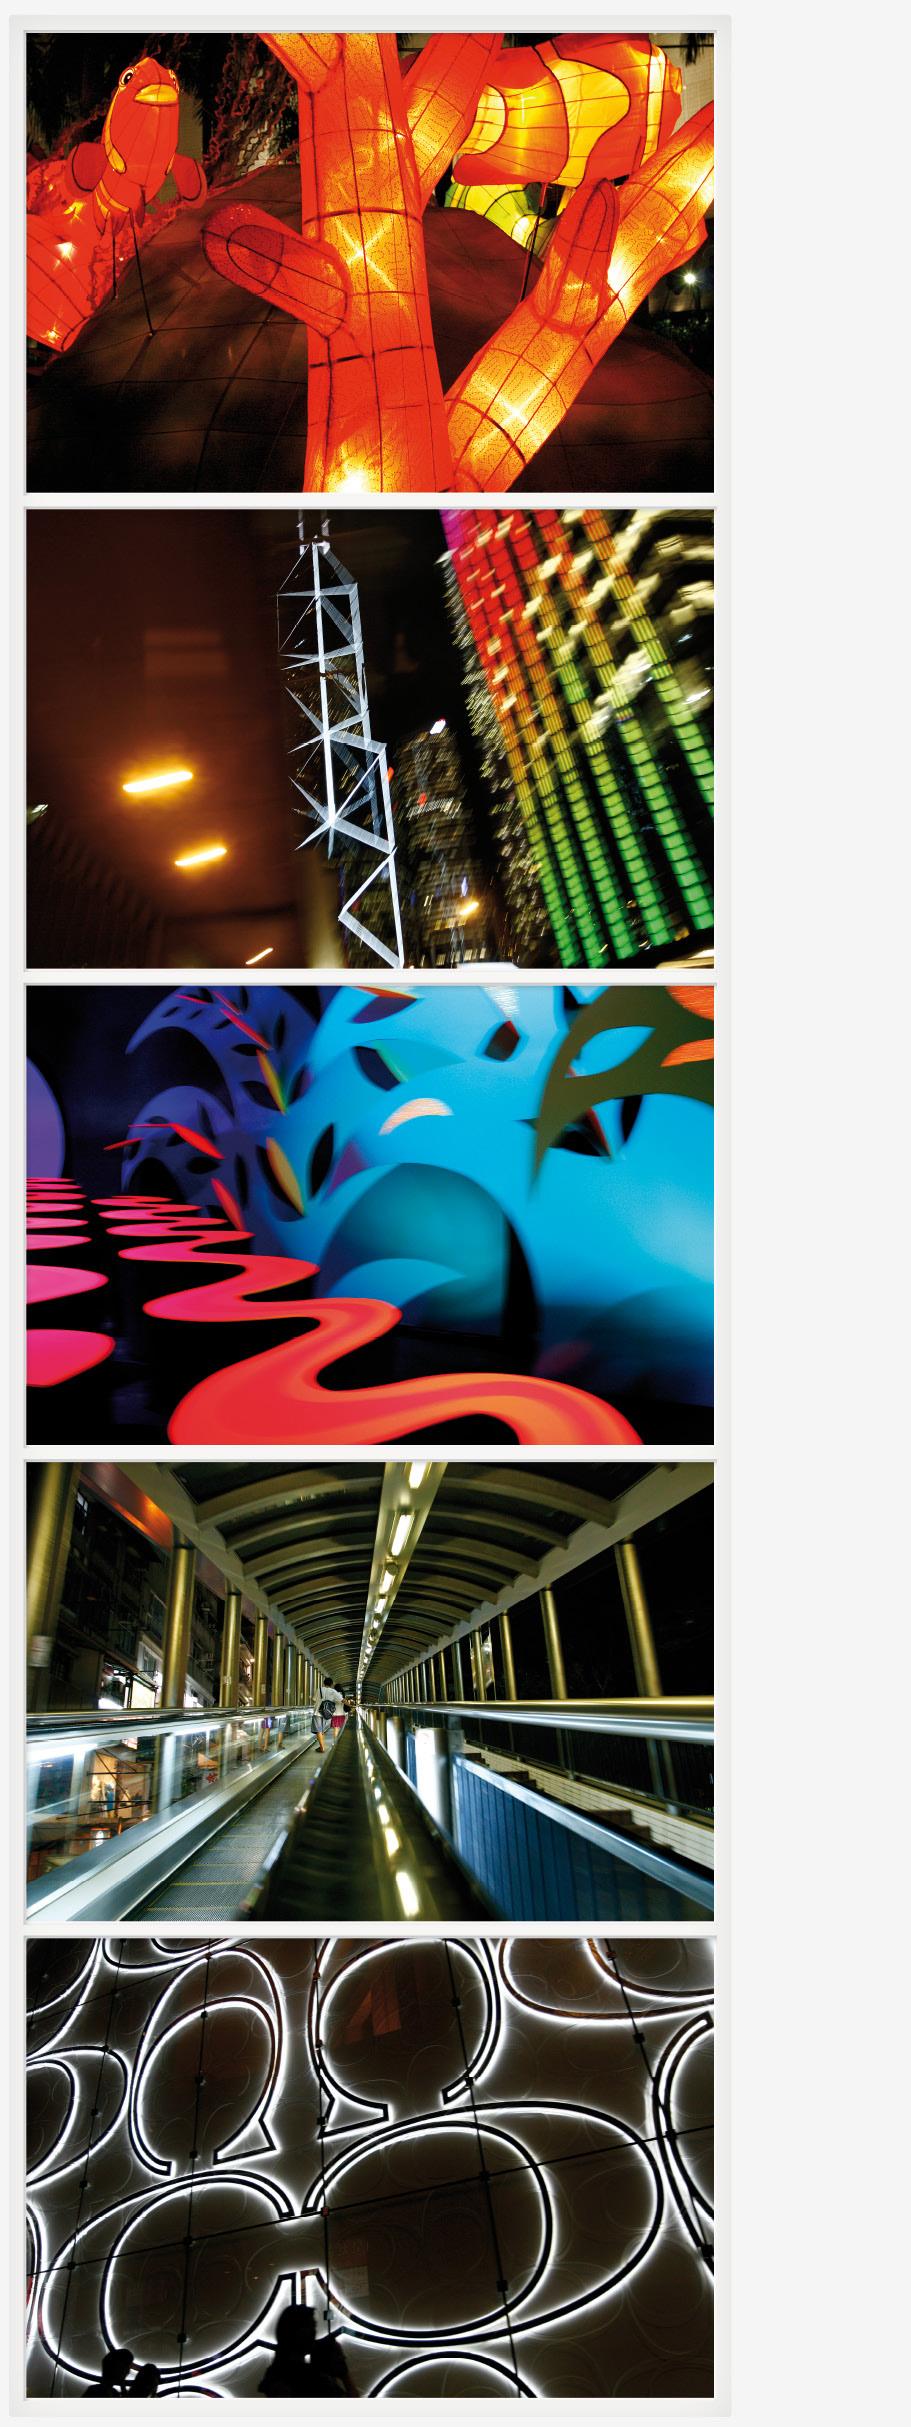 07_HONG KONG_CITY NEON LIGHTS